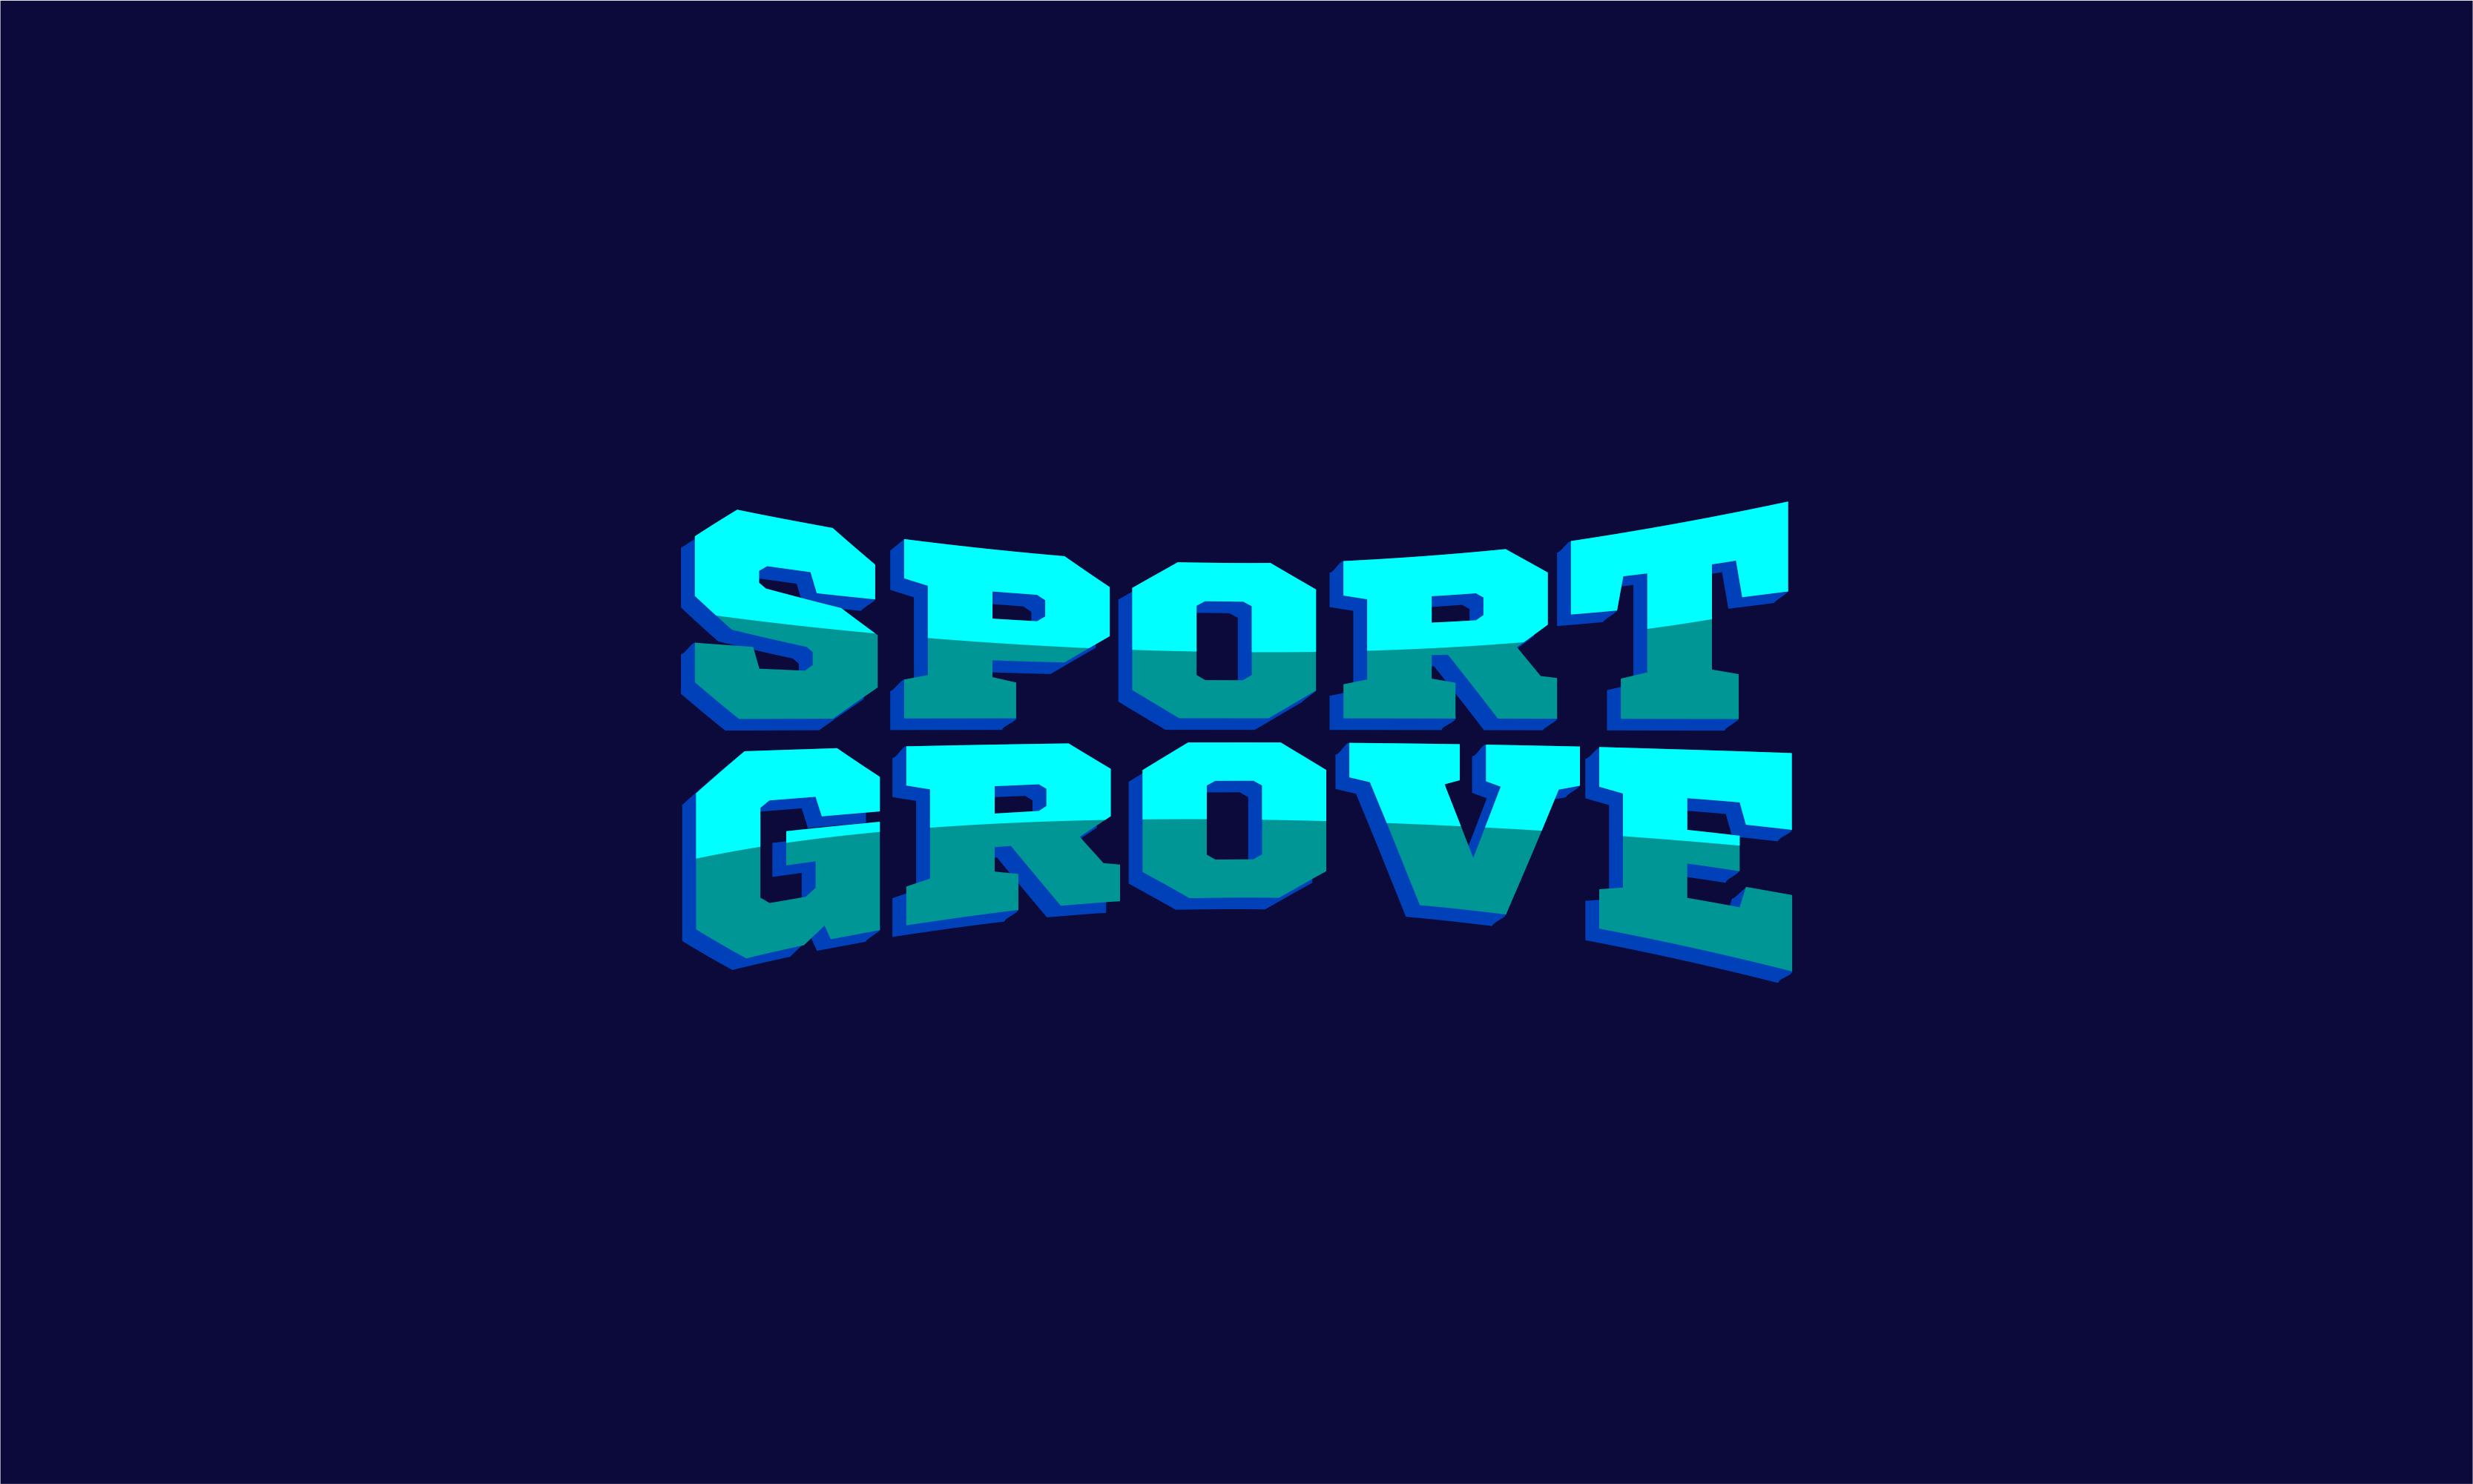 Sportgrove